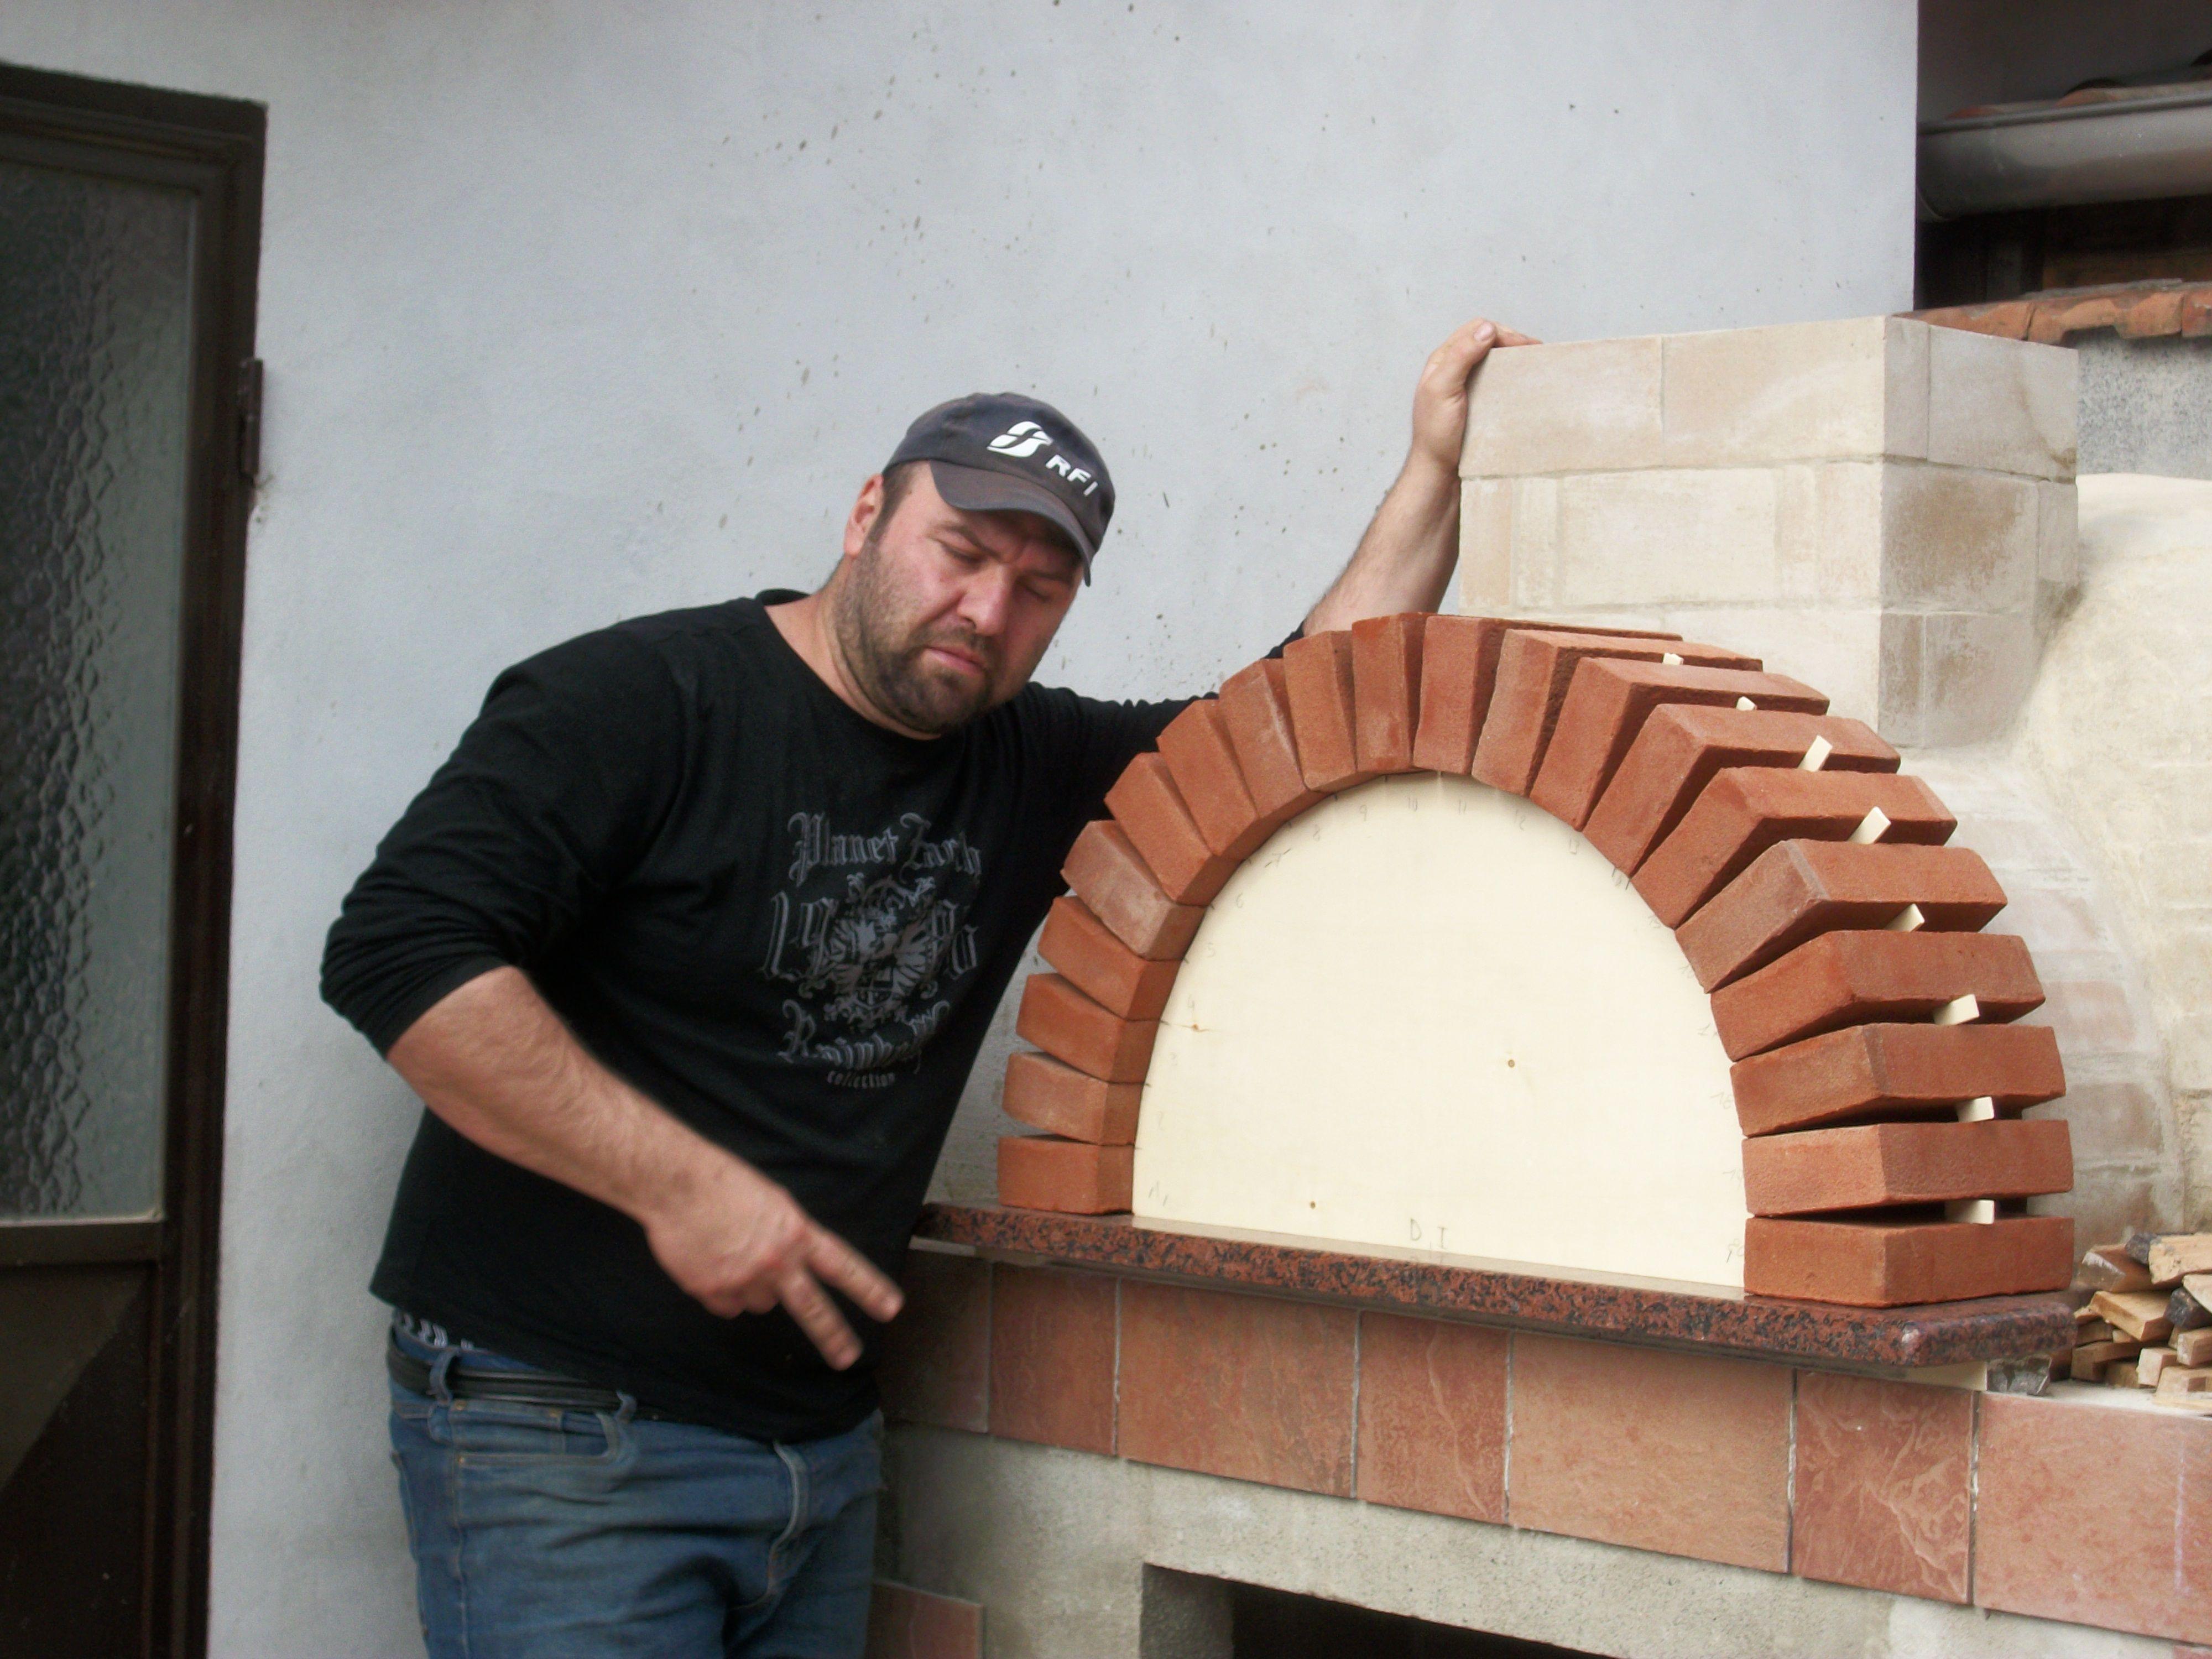 Forno a legna e barbeque fai da te forno a legna pinterest for Forno a legna fai da te economico